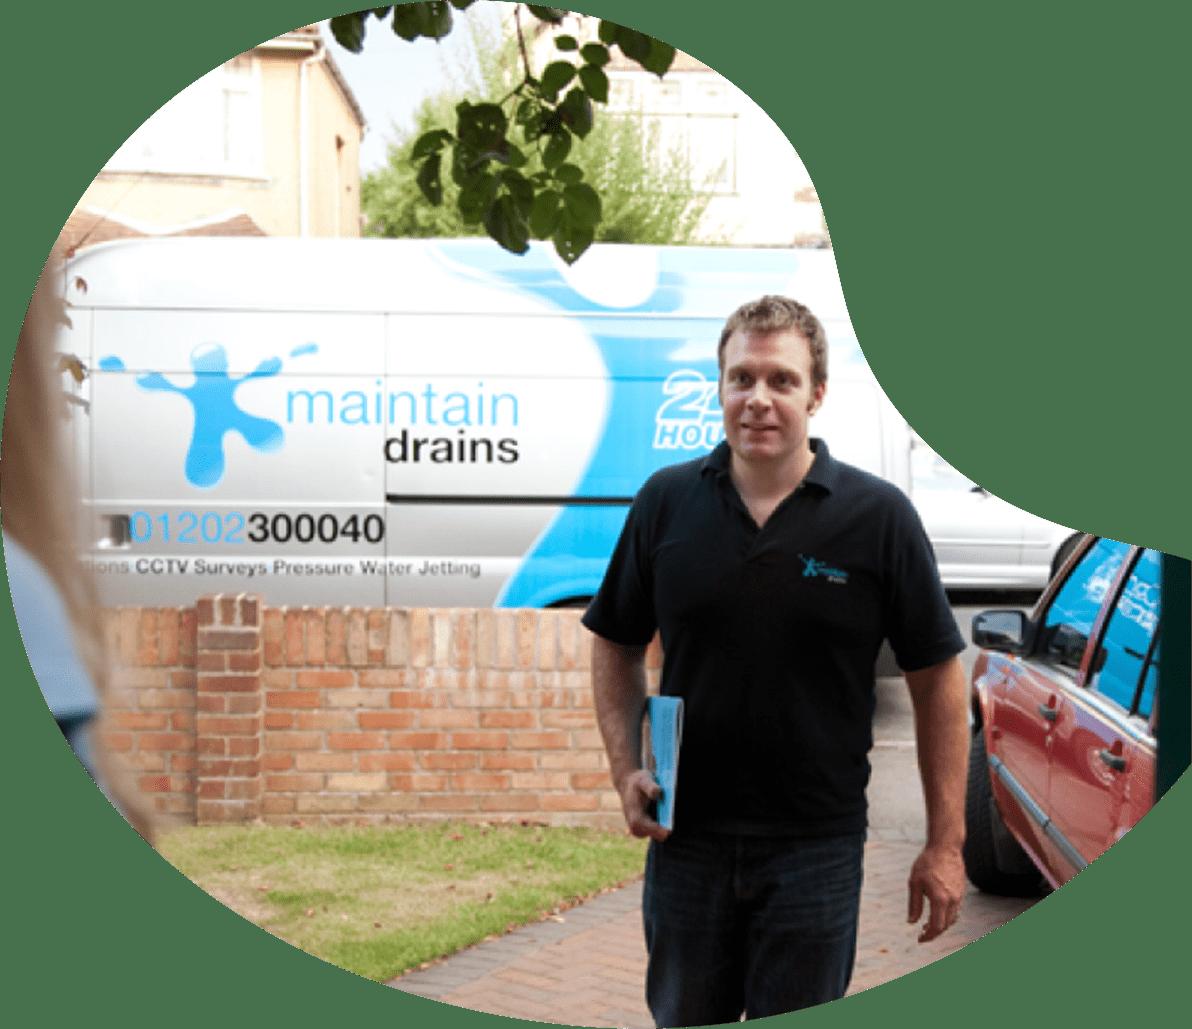 Maintain drains plumber visiting customer